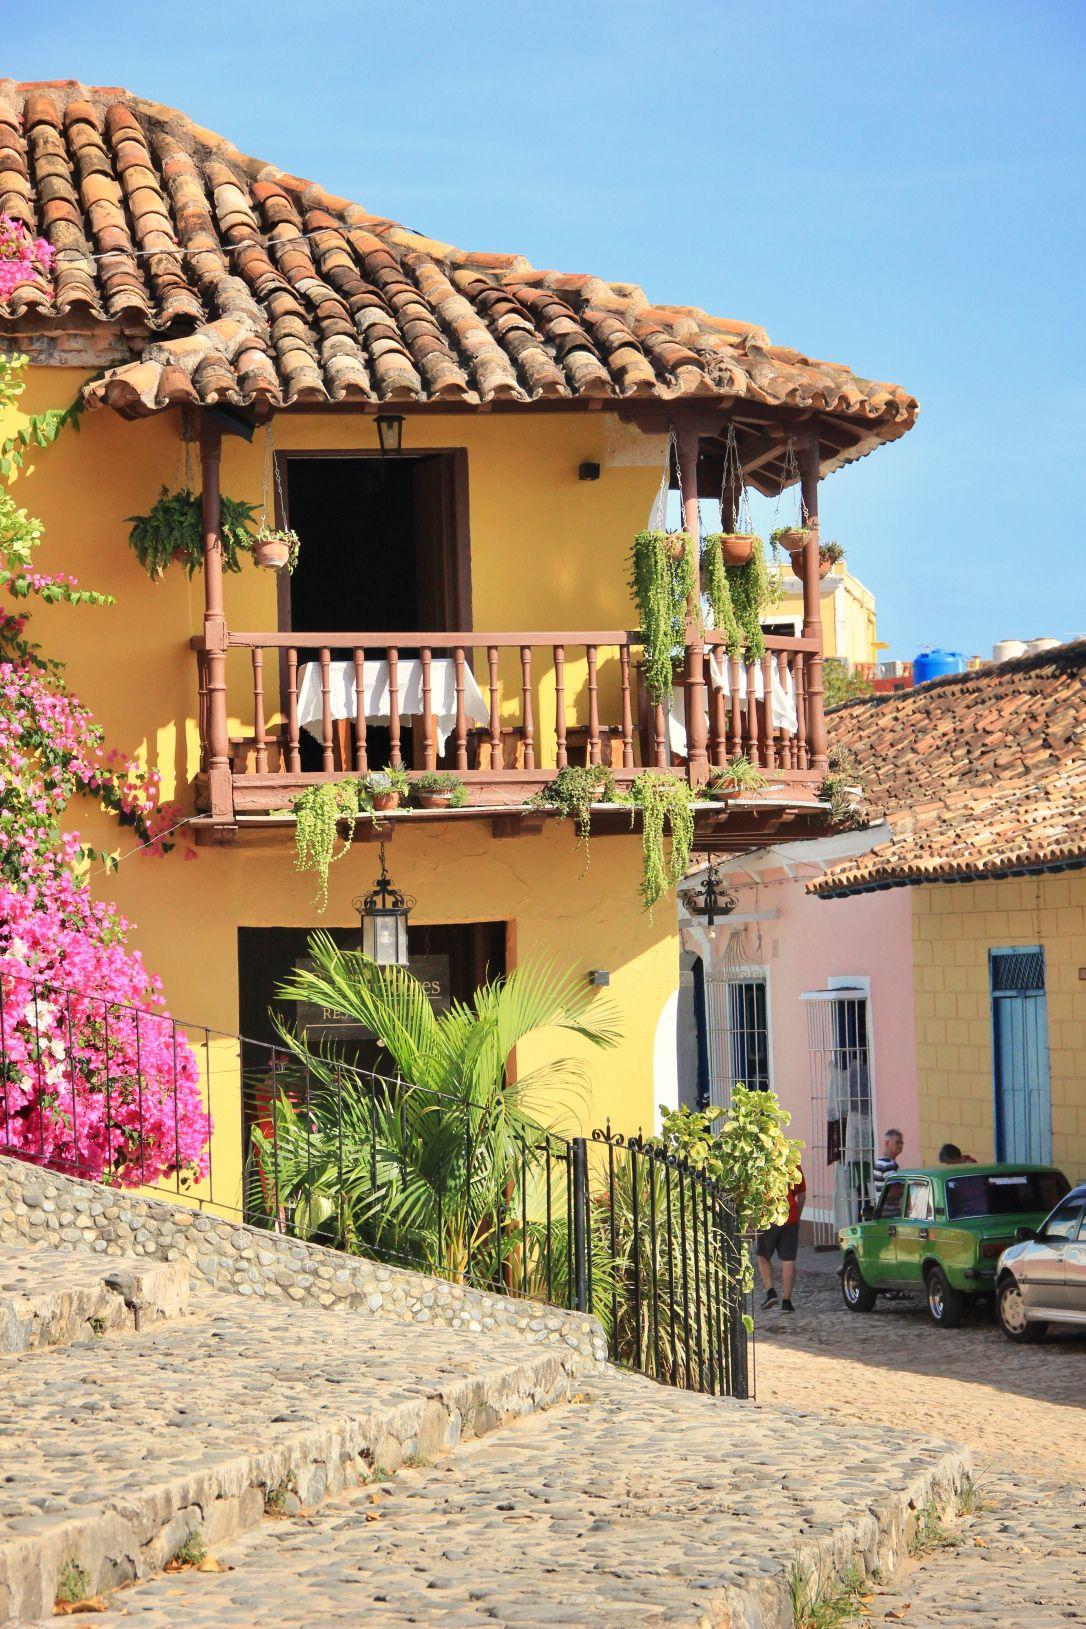 Three Nights In Trinidad Cuba Travel Diary Sophar So Good Trinidad Cuba Cuba Travel Cuba Street